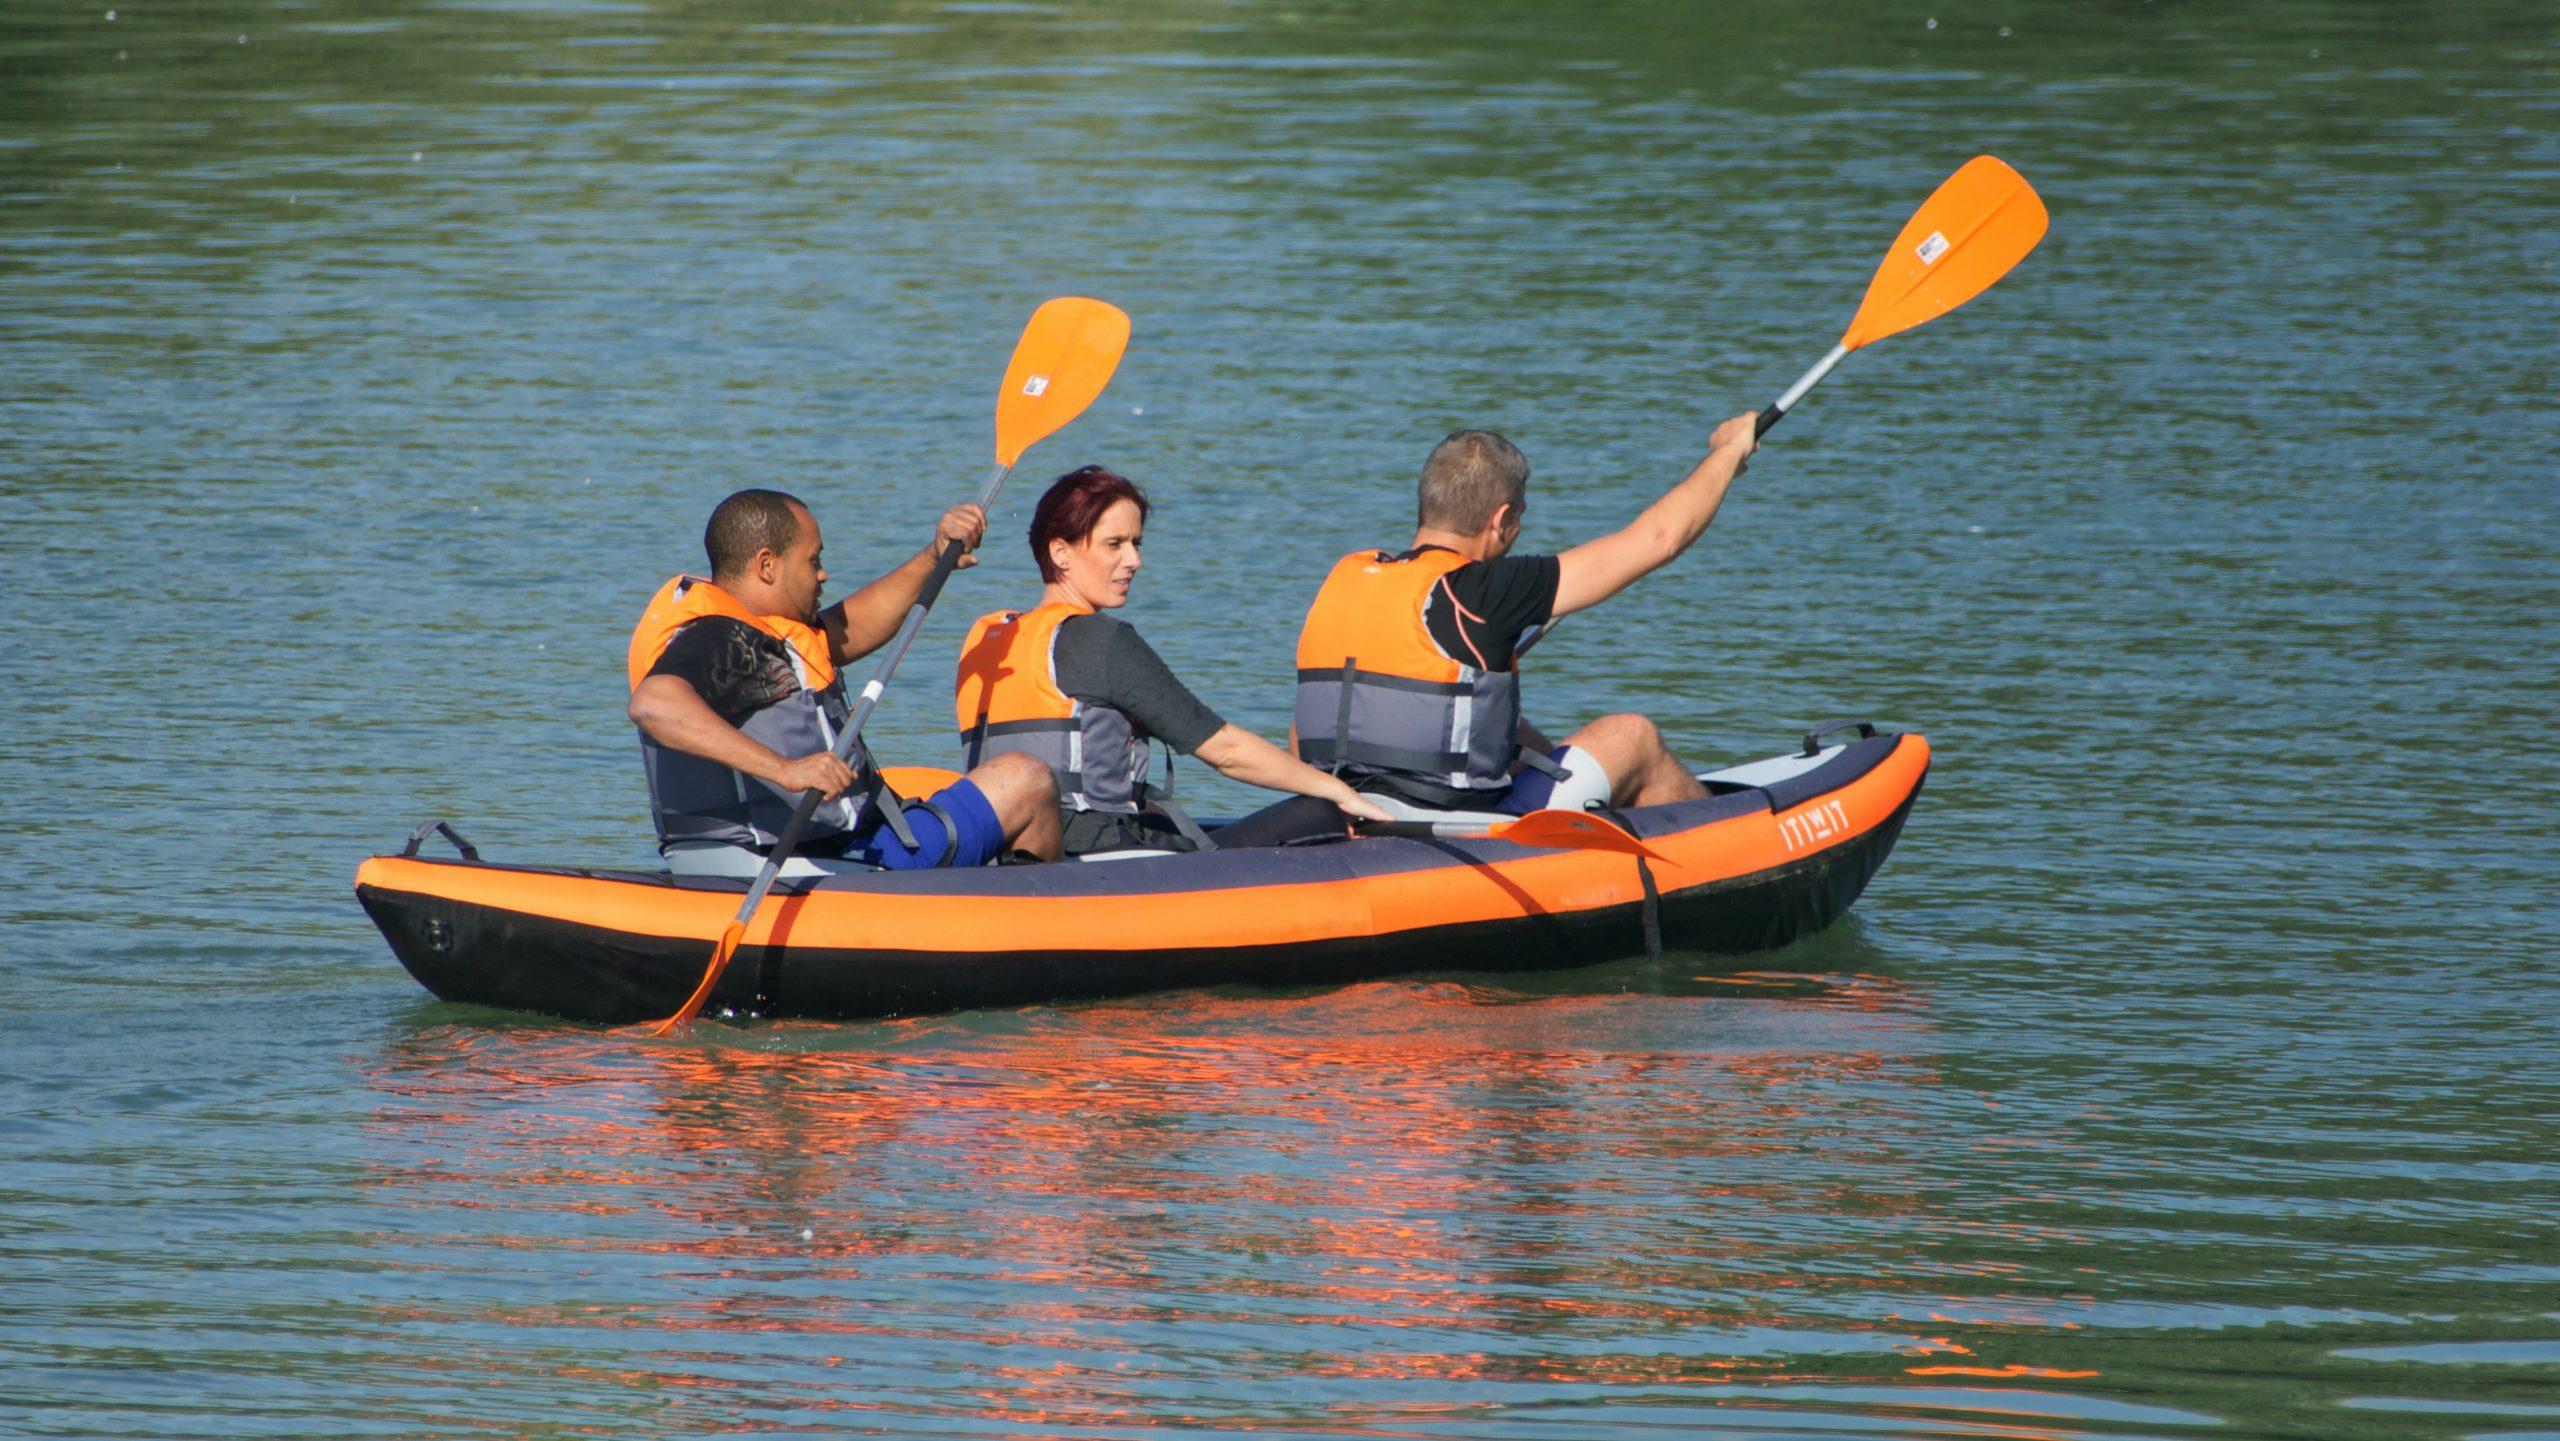 Why Buy An Inflatable Kayak?